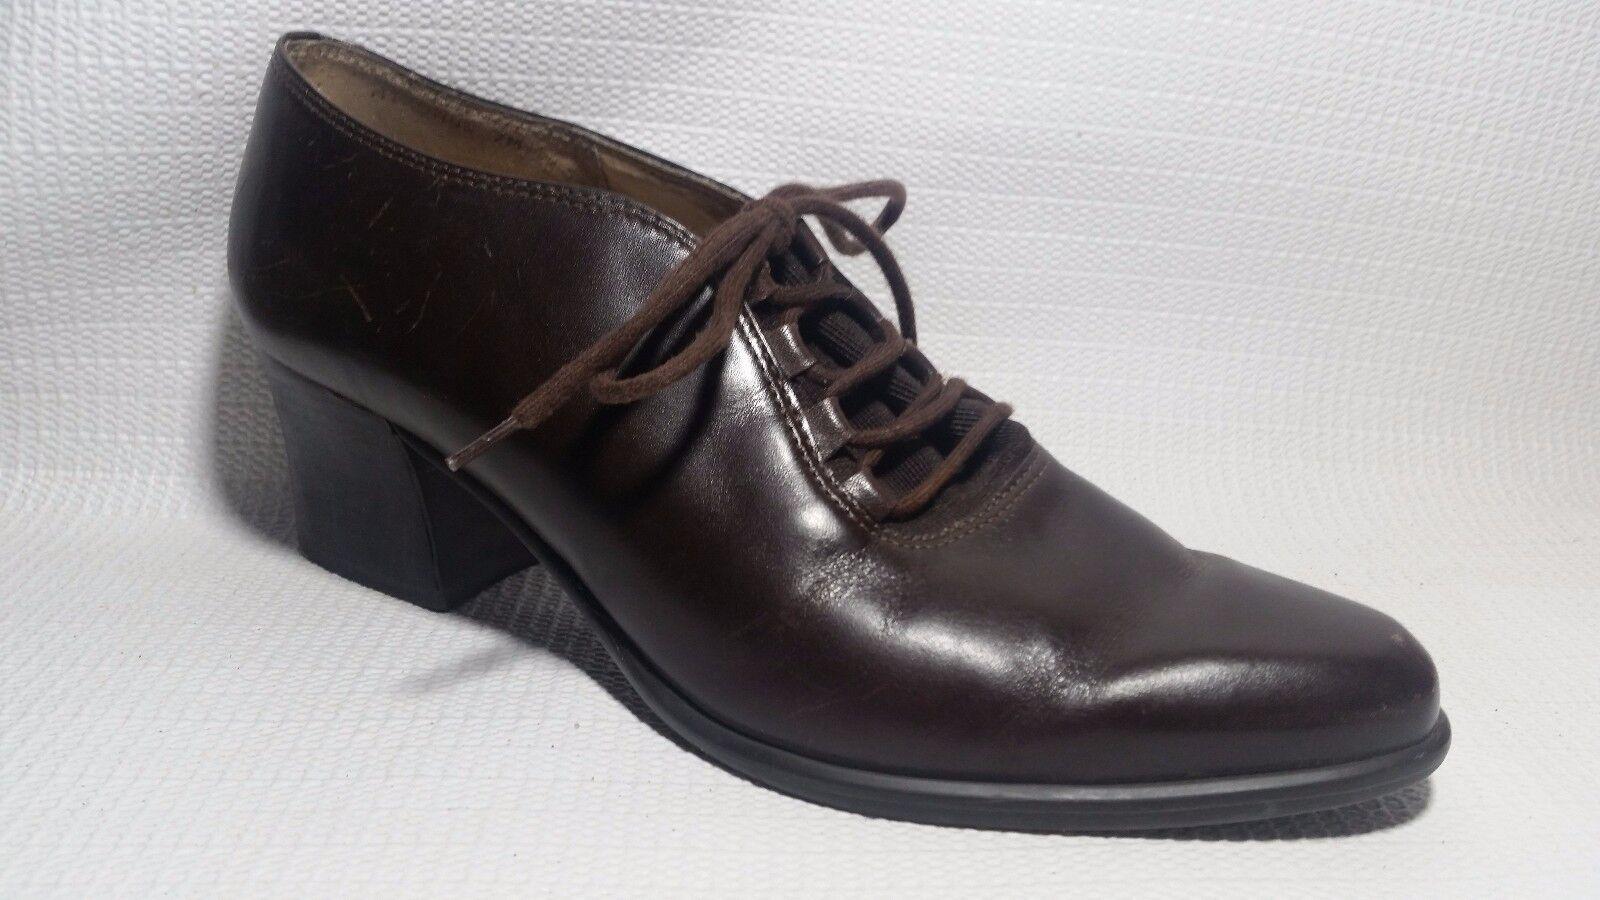 Jennifer Moore Womens 7 M Brown Leather Mikonos Block Heel 20's Loafers Booties